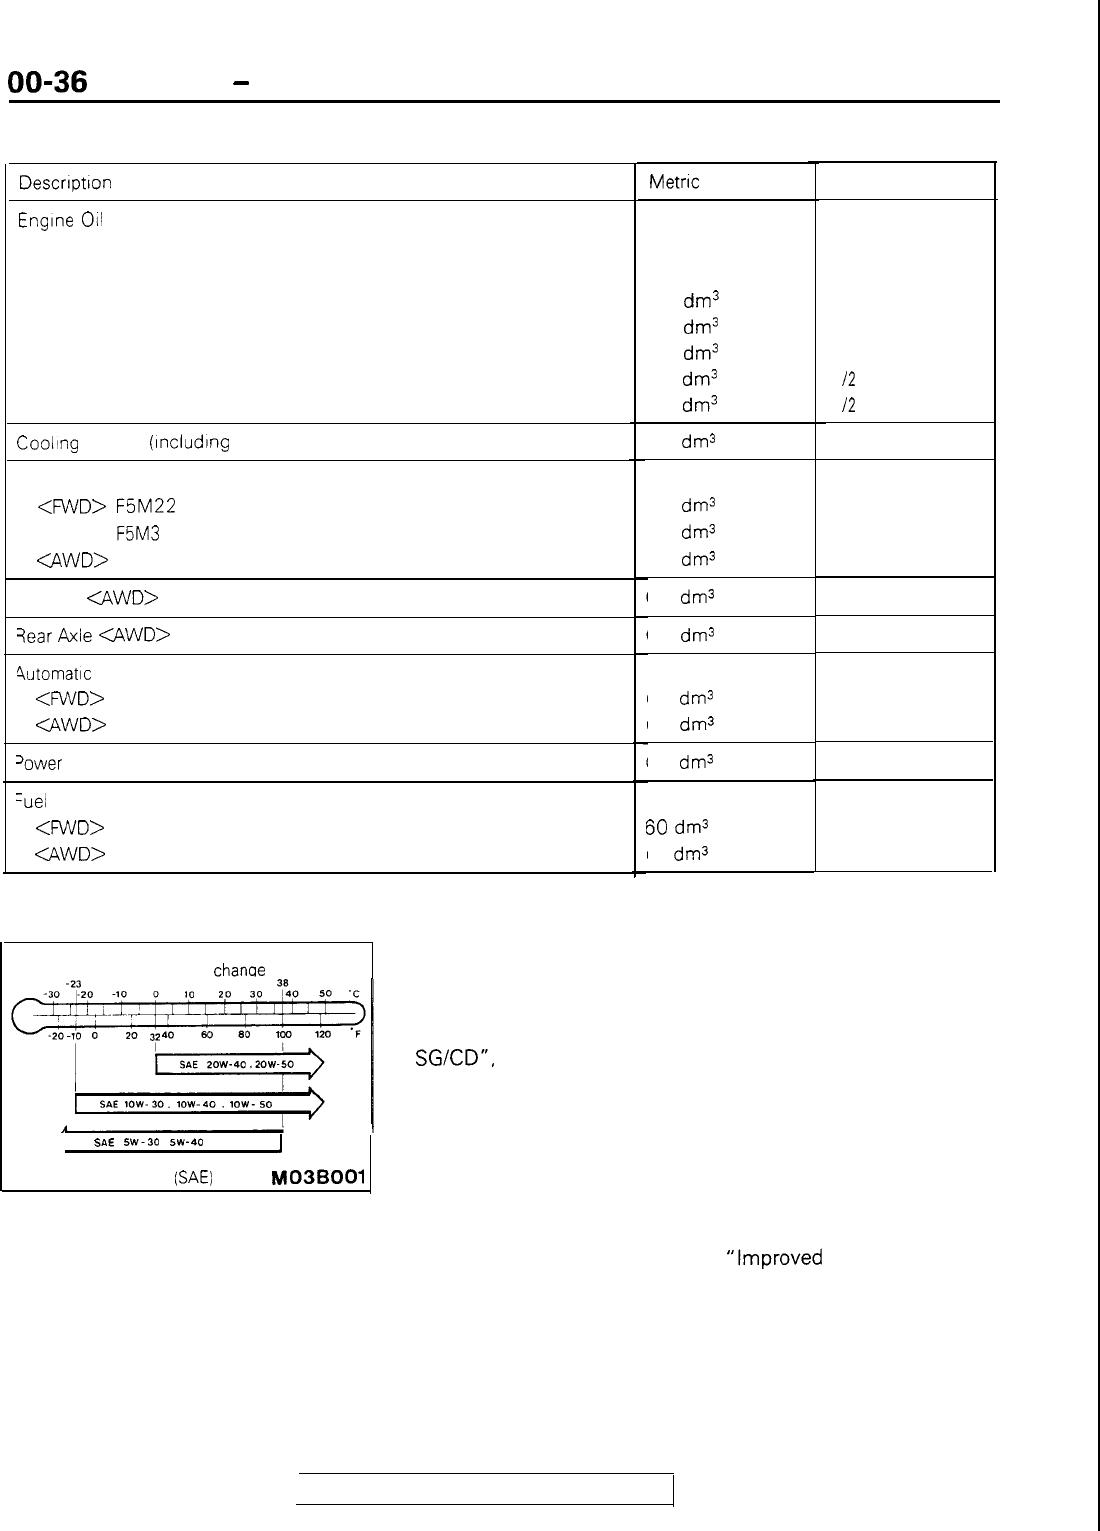 Mitsubishi Galant 1989 1993 Workshop Manua 1 PDF